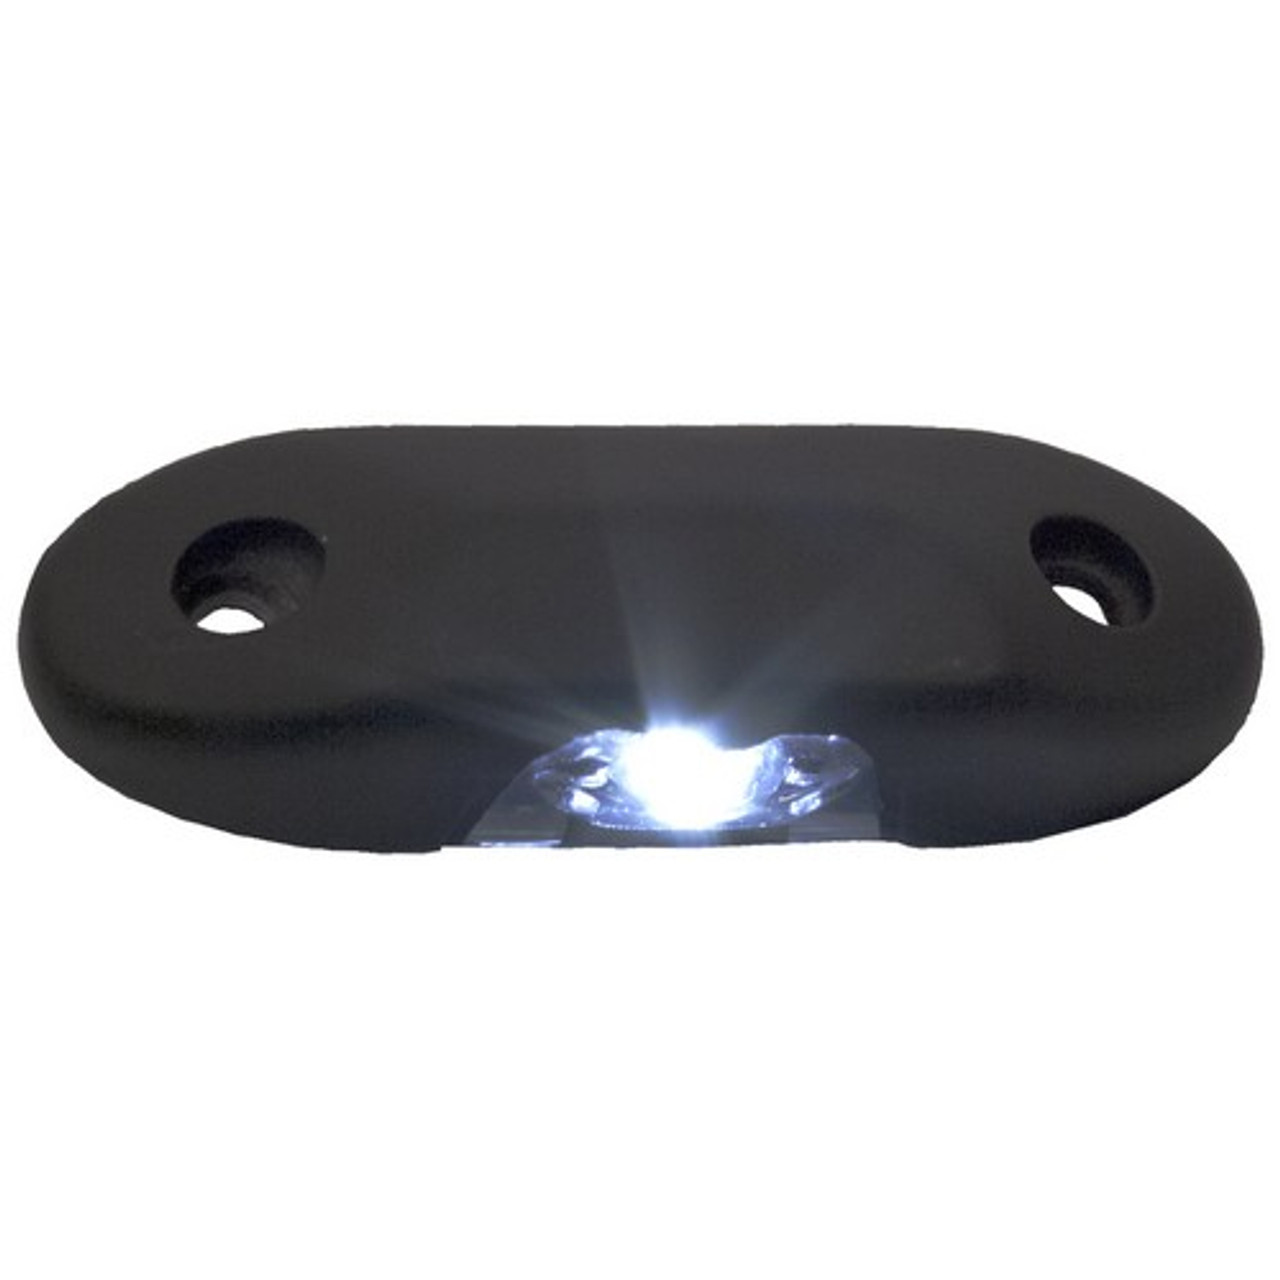 Peterson License & Utility Light 12V (18-1431)